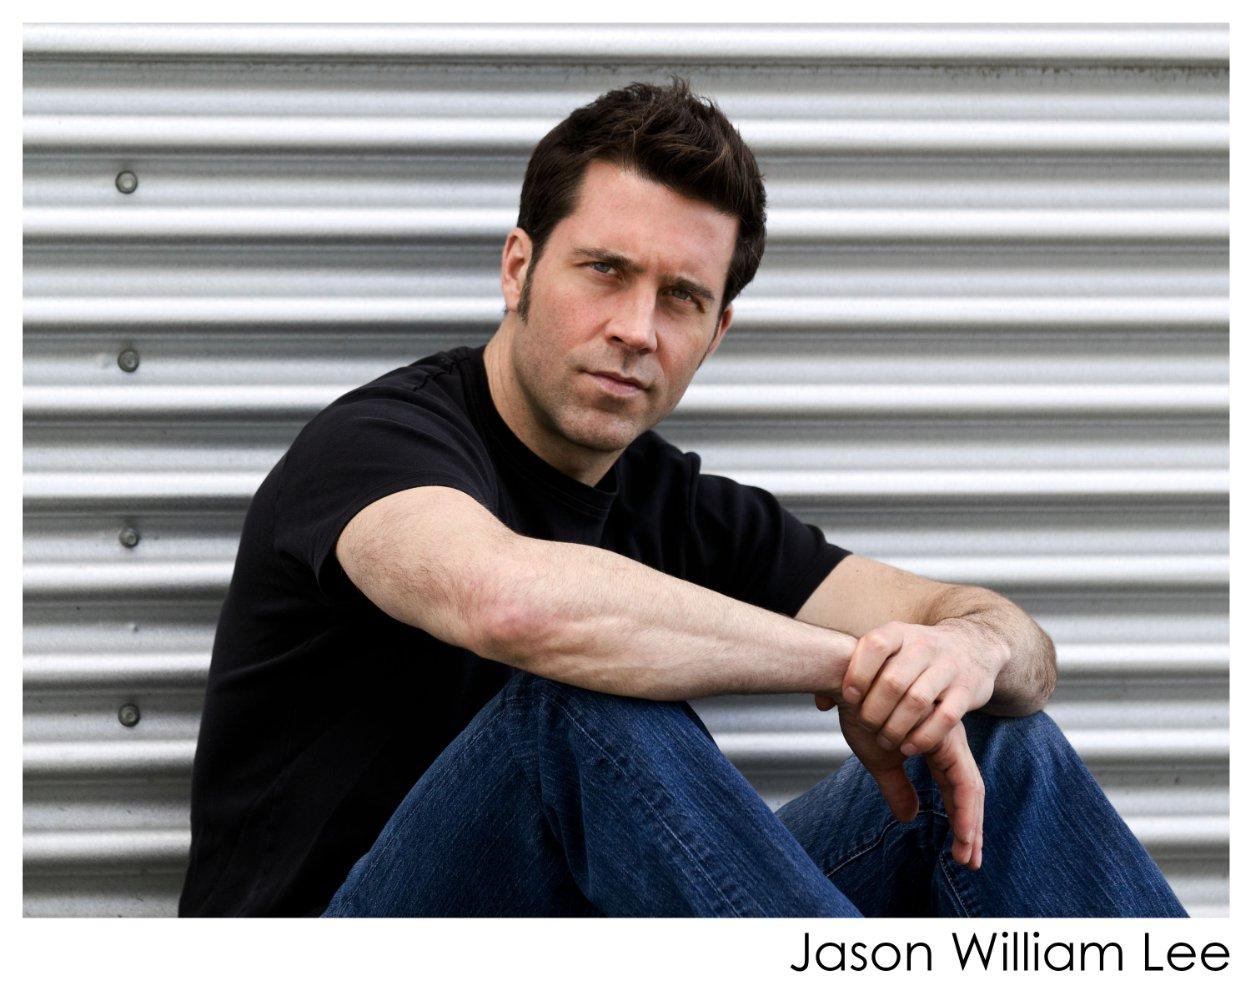 Jason William Lee